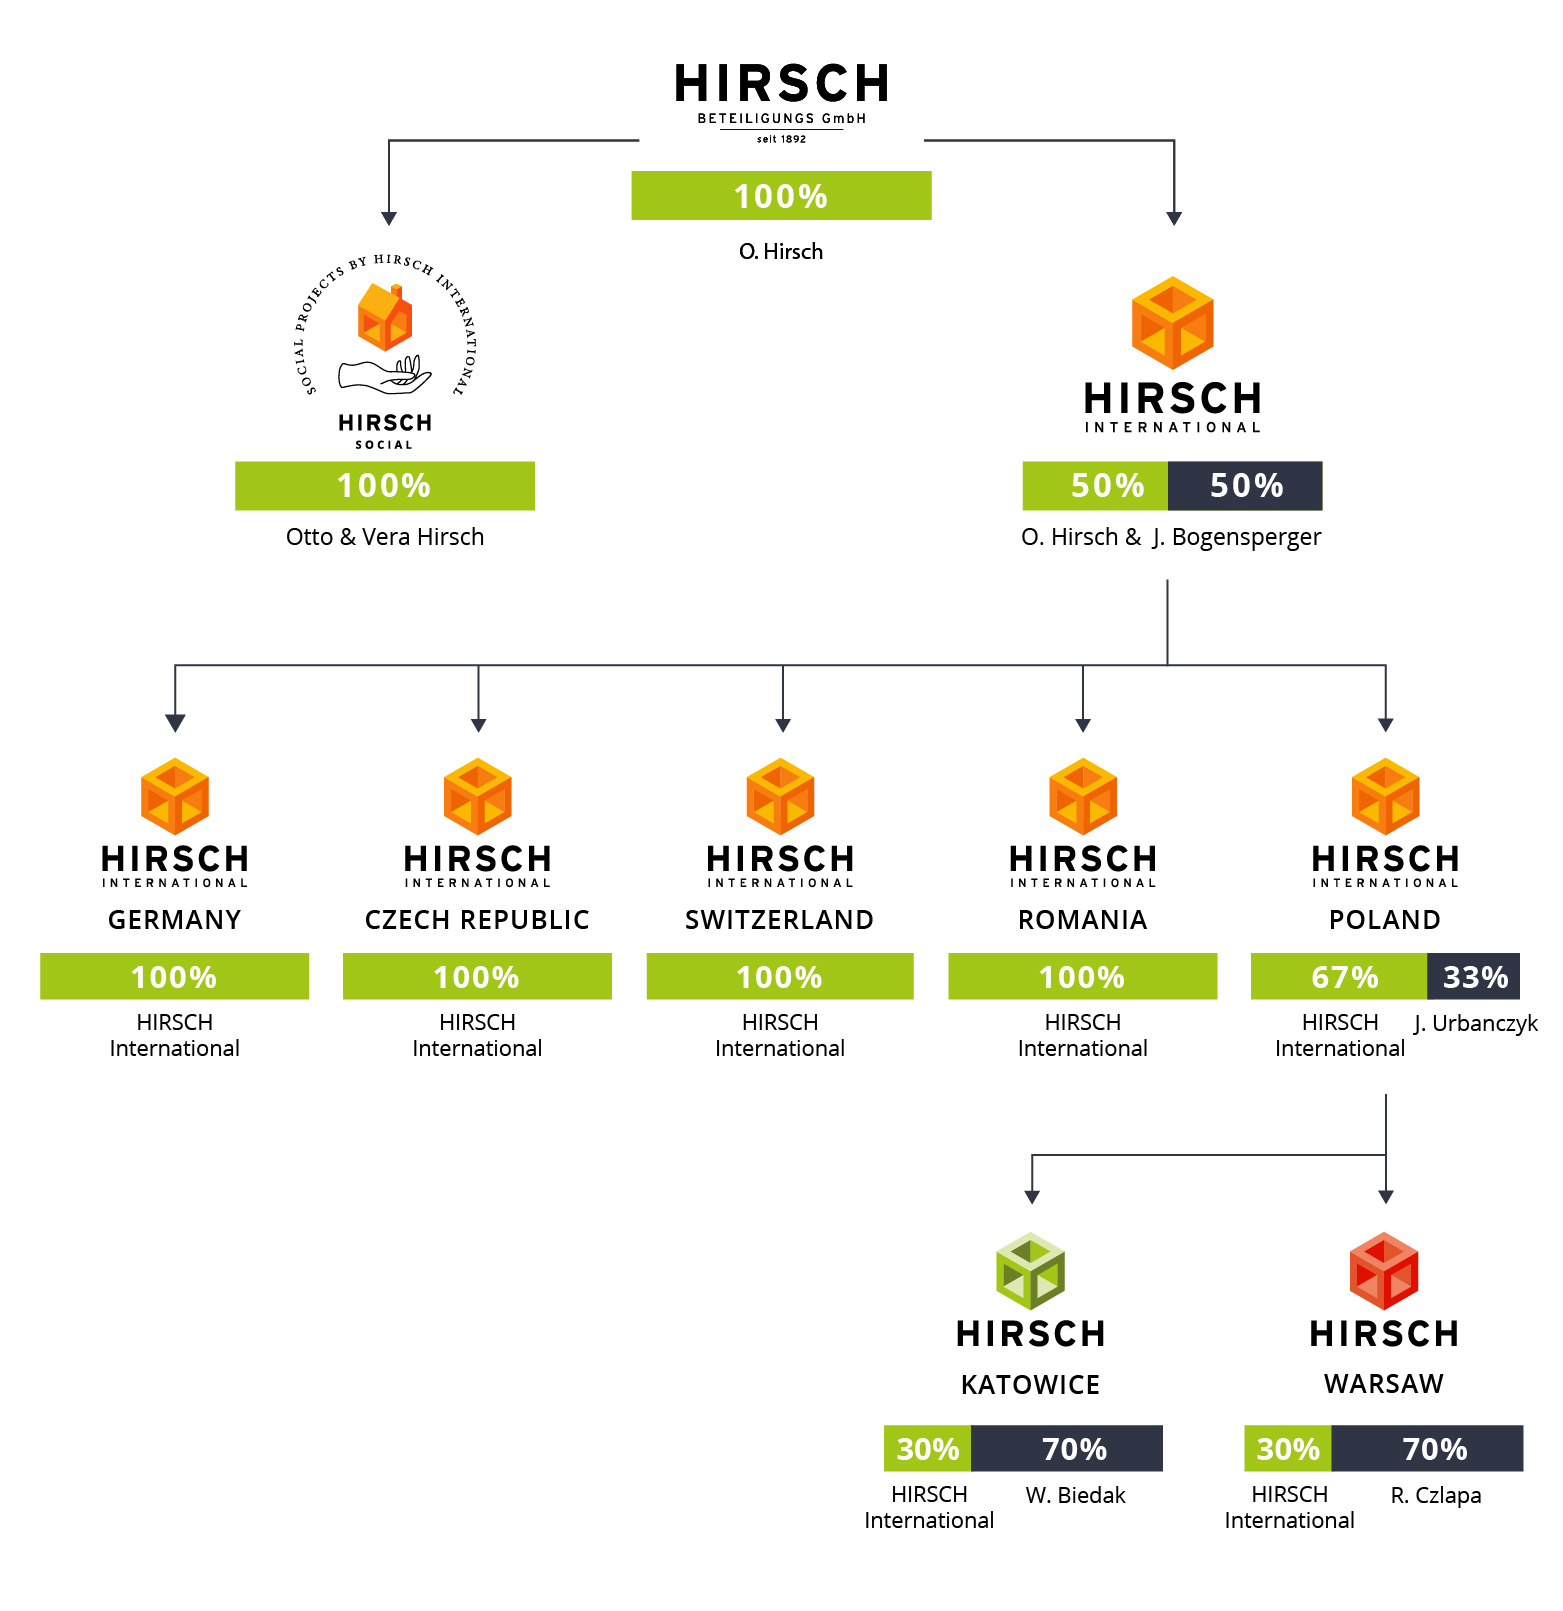 Hirsch International GMBH FAMILIE